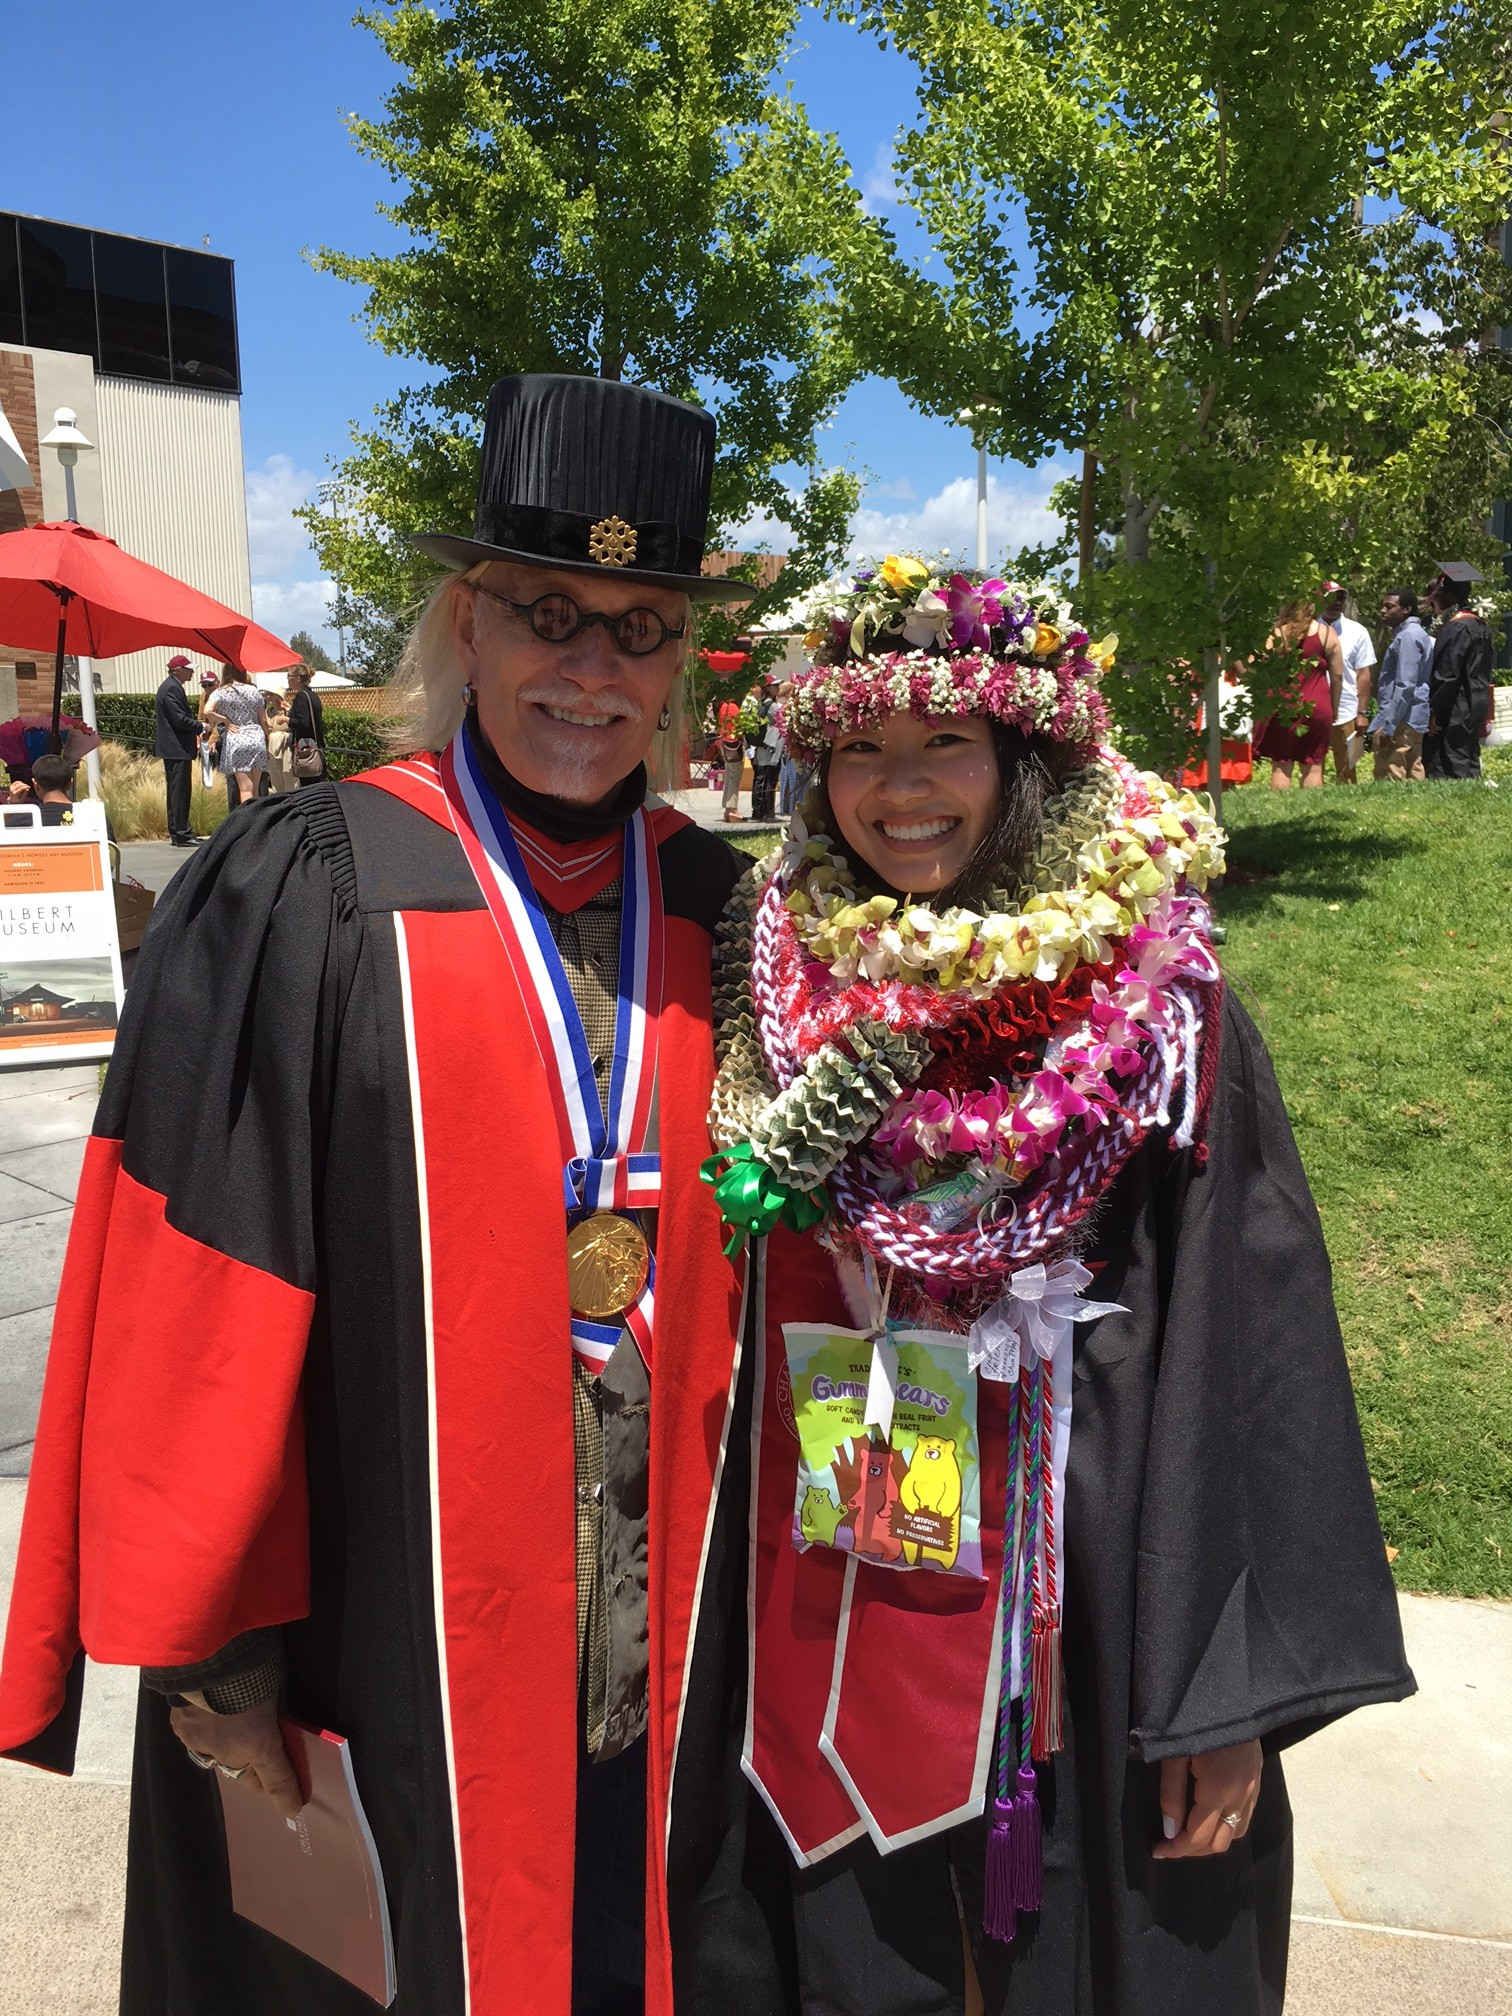 2016 Chapman University Graduation2